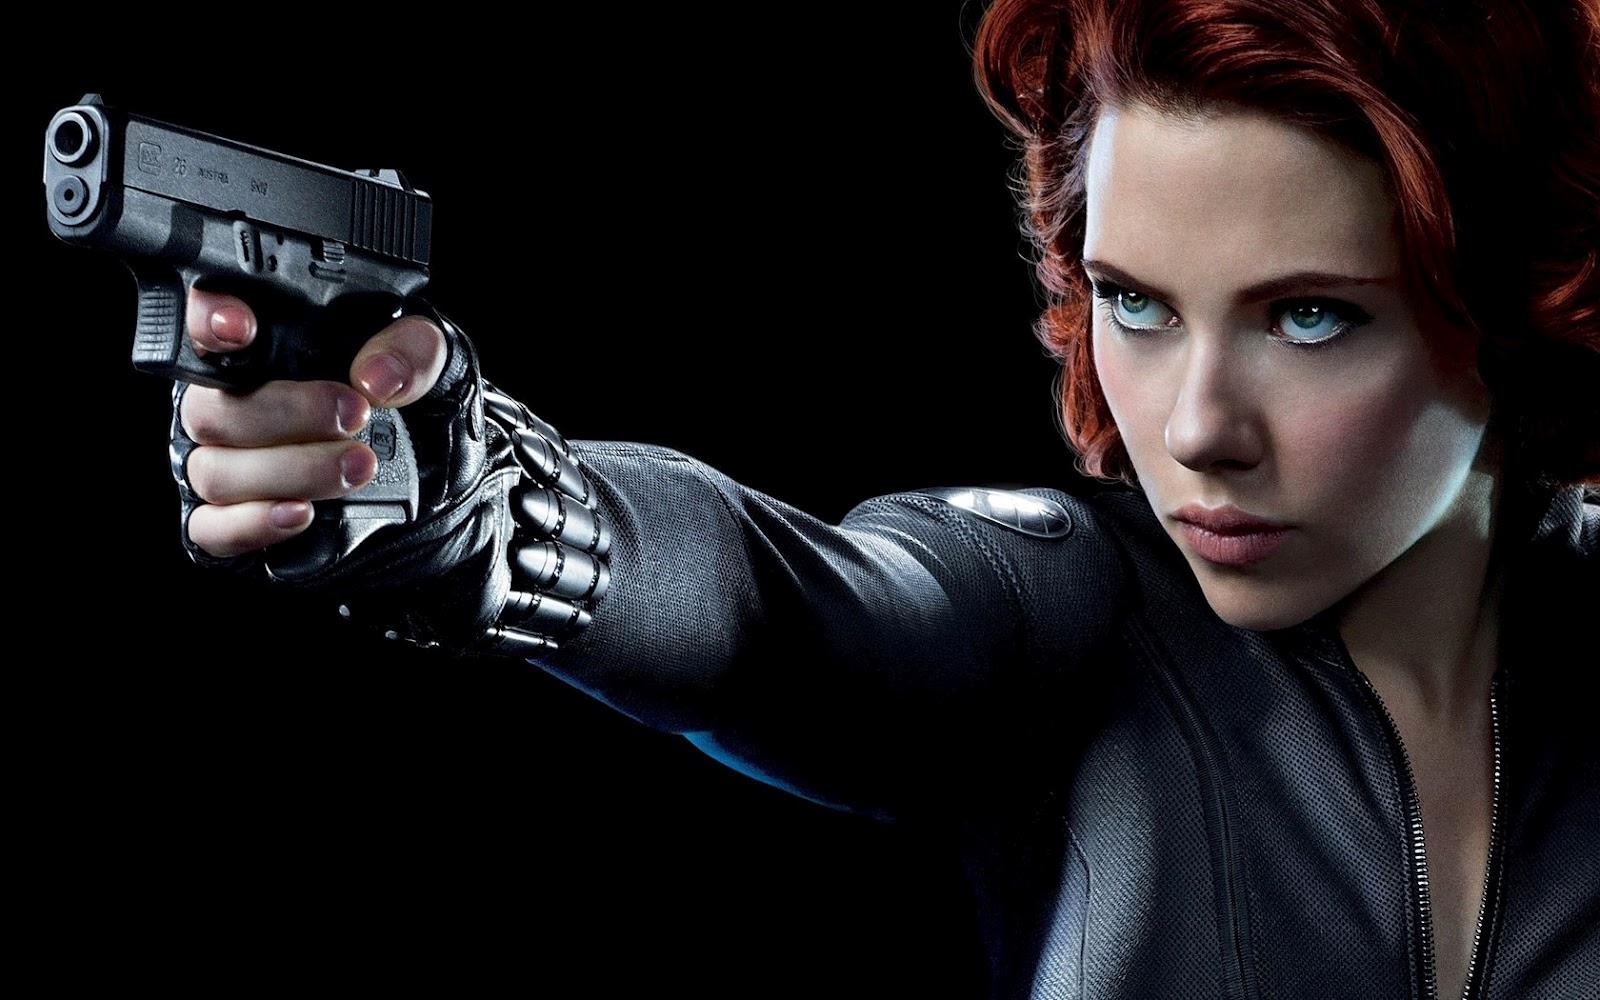 Wllpaper The Avengers Scarlett Johansson Black Widow Wallpaper 1600x1000